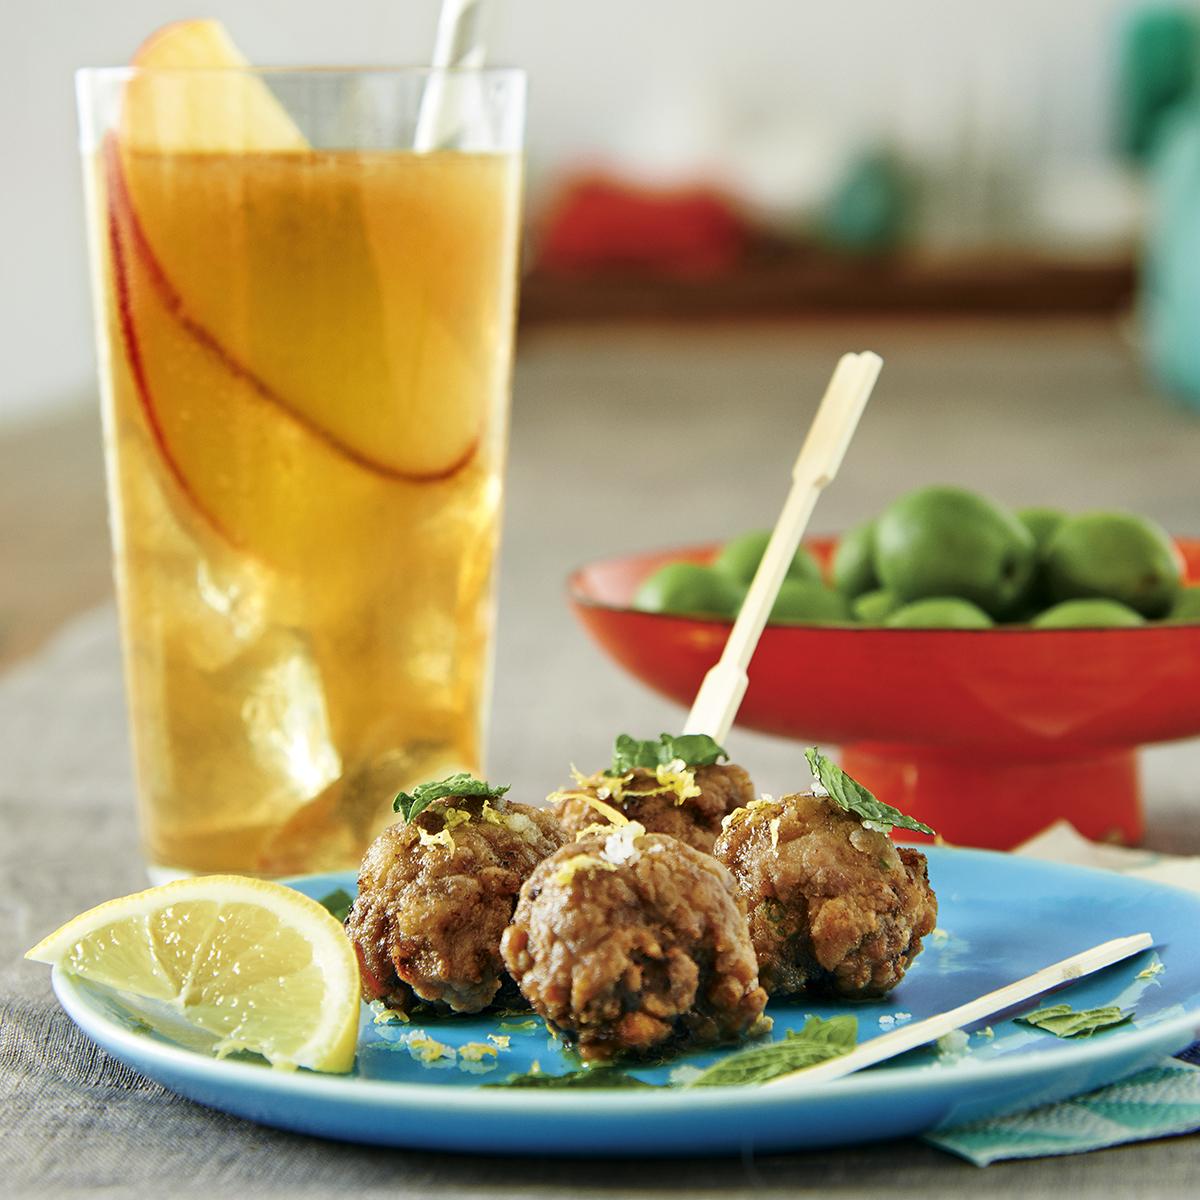 Michael Symon's Greek Meatballs